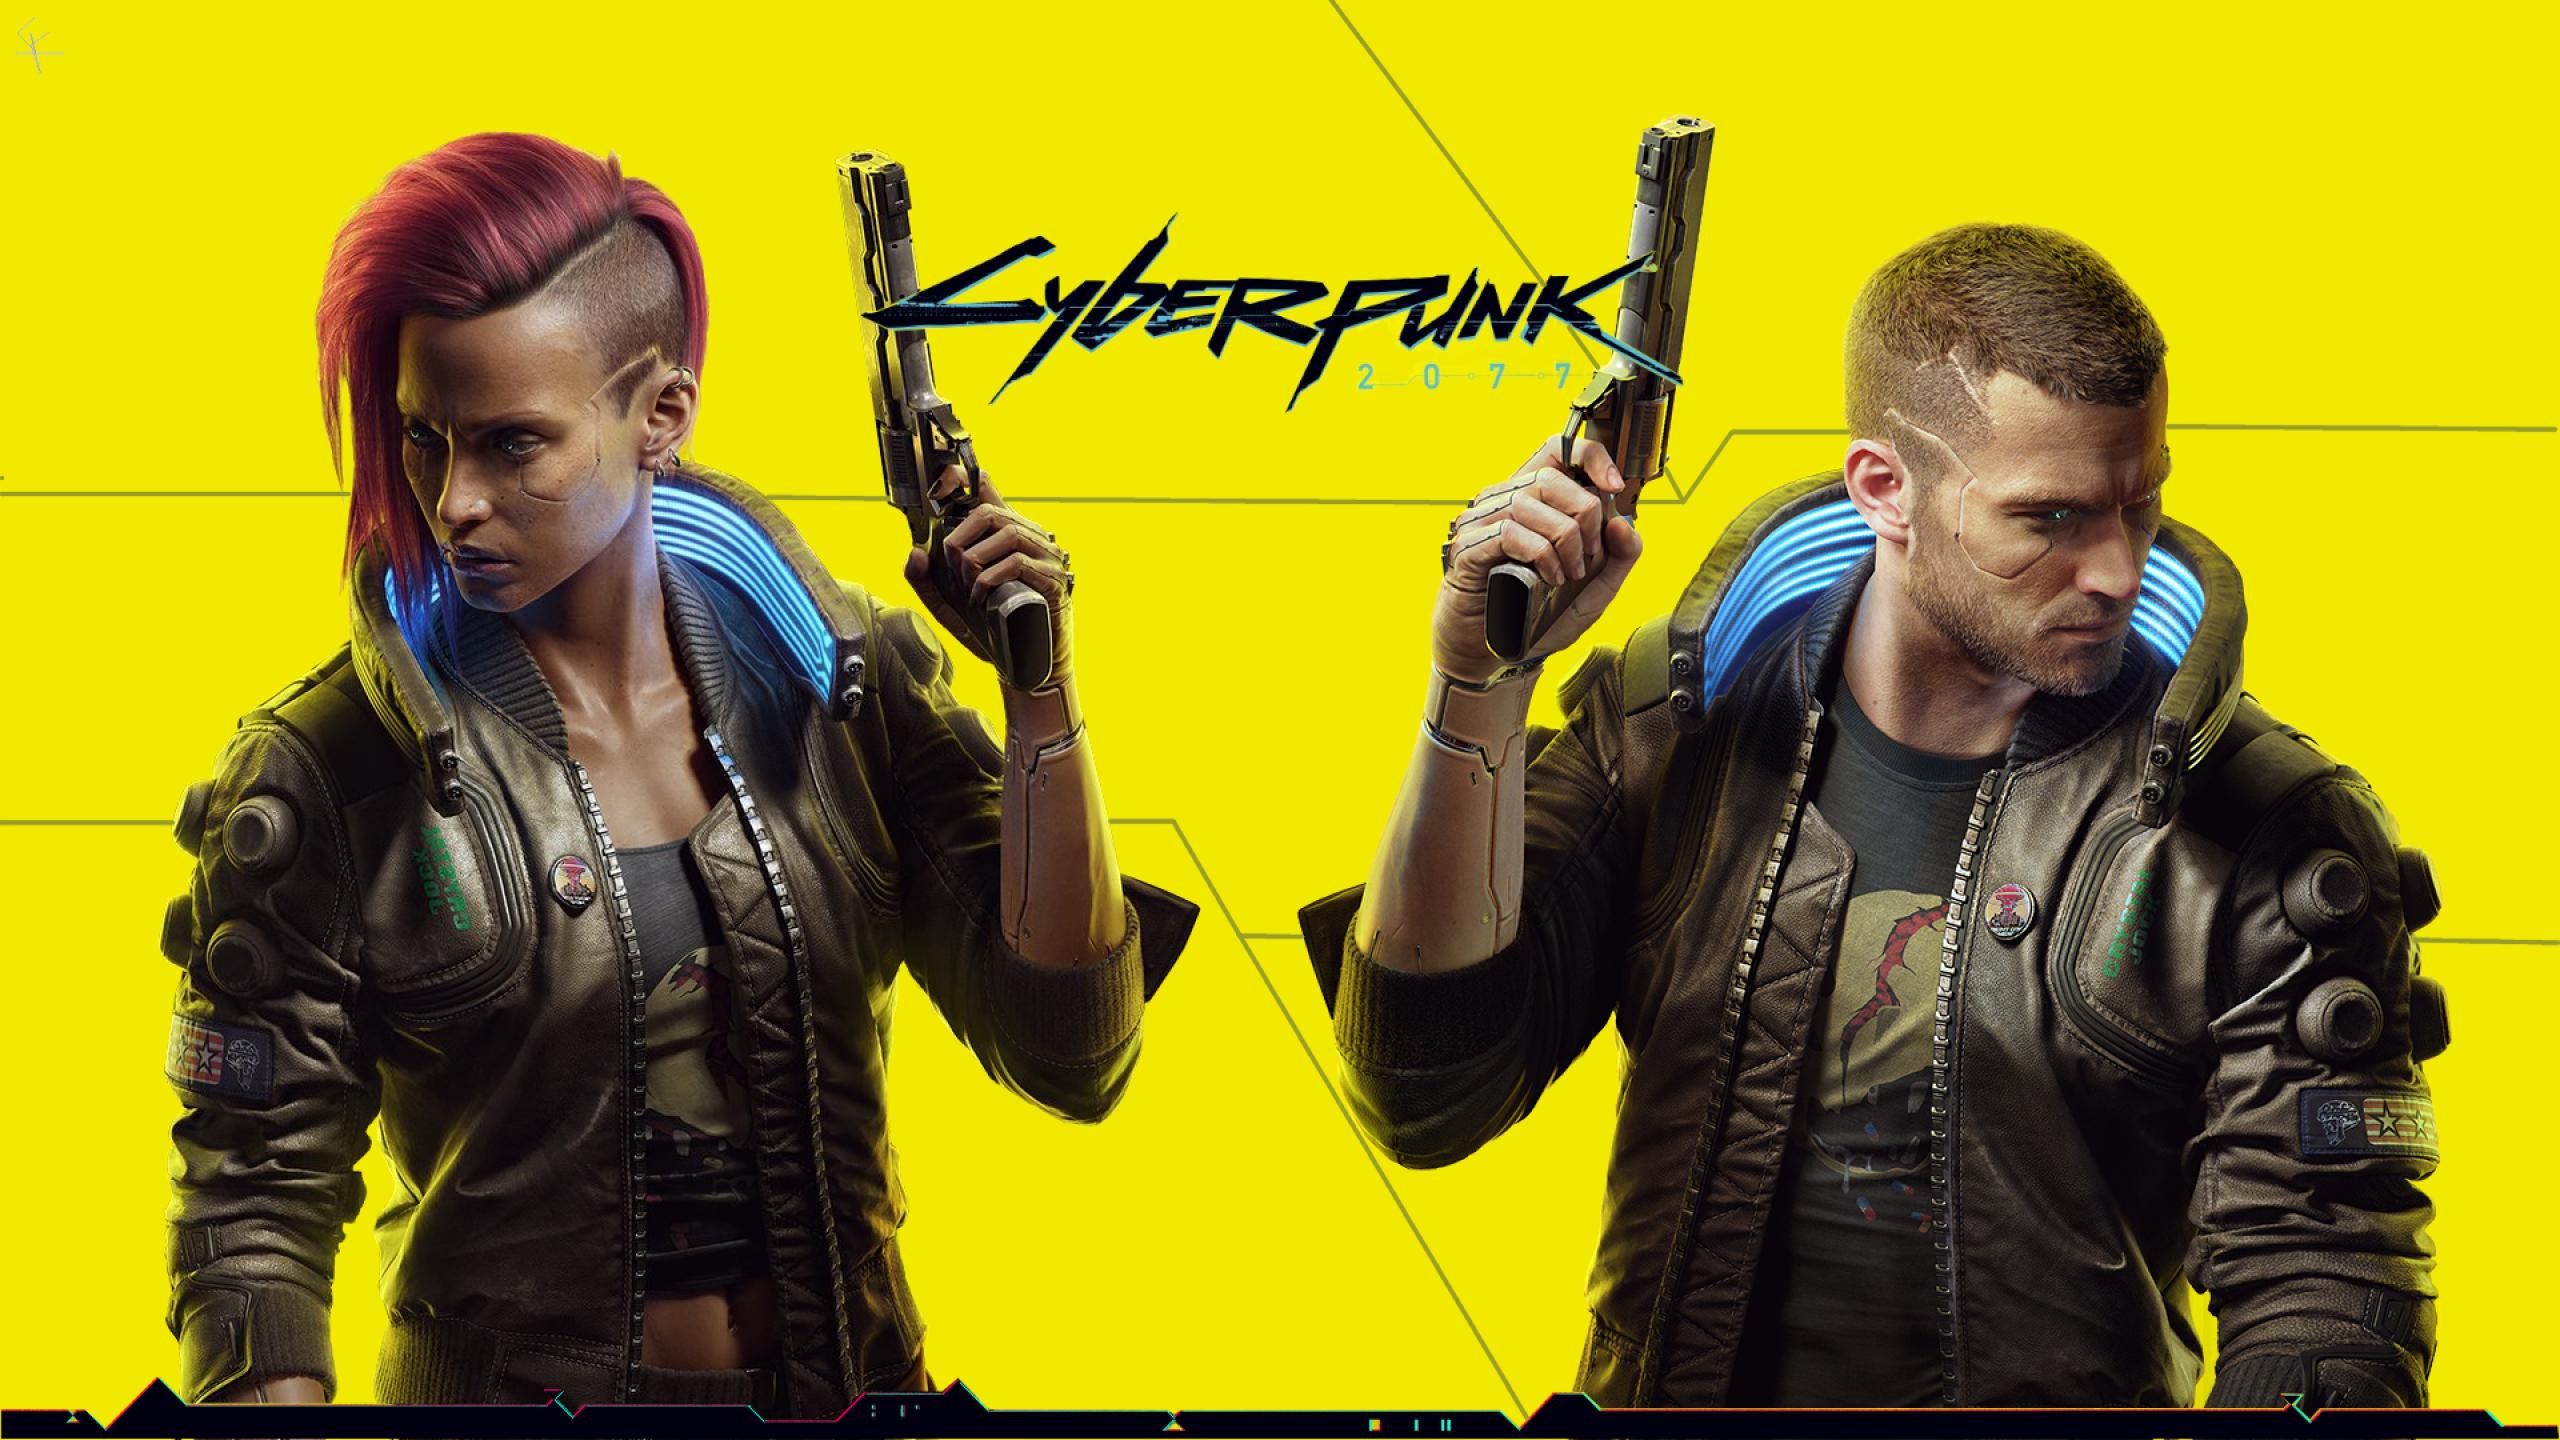 2560x1440 Background of Cyberpunk 2077 1440P Resolution ...